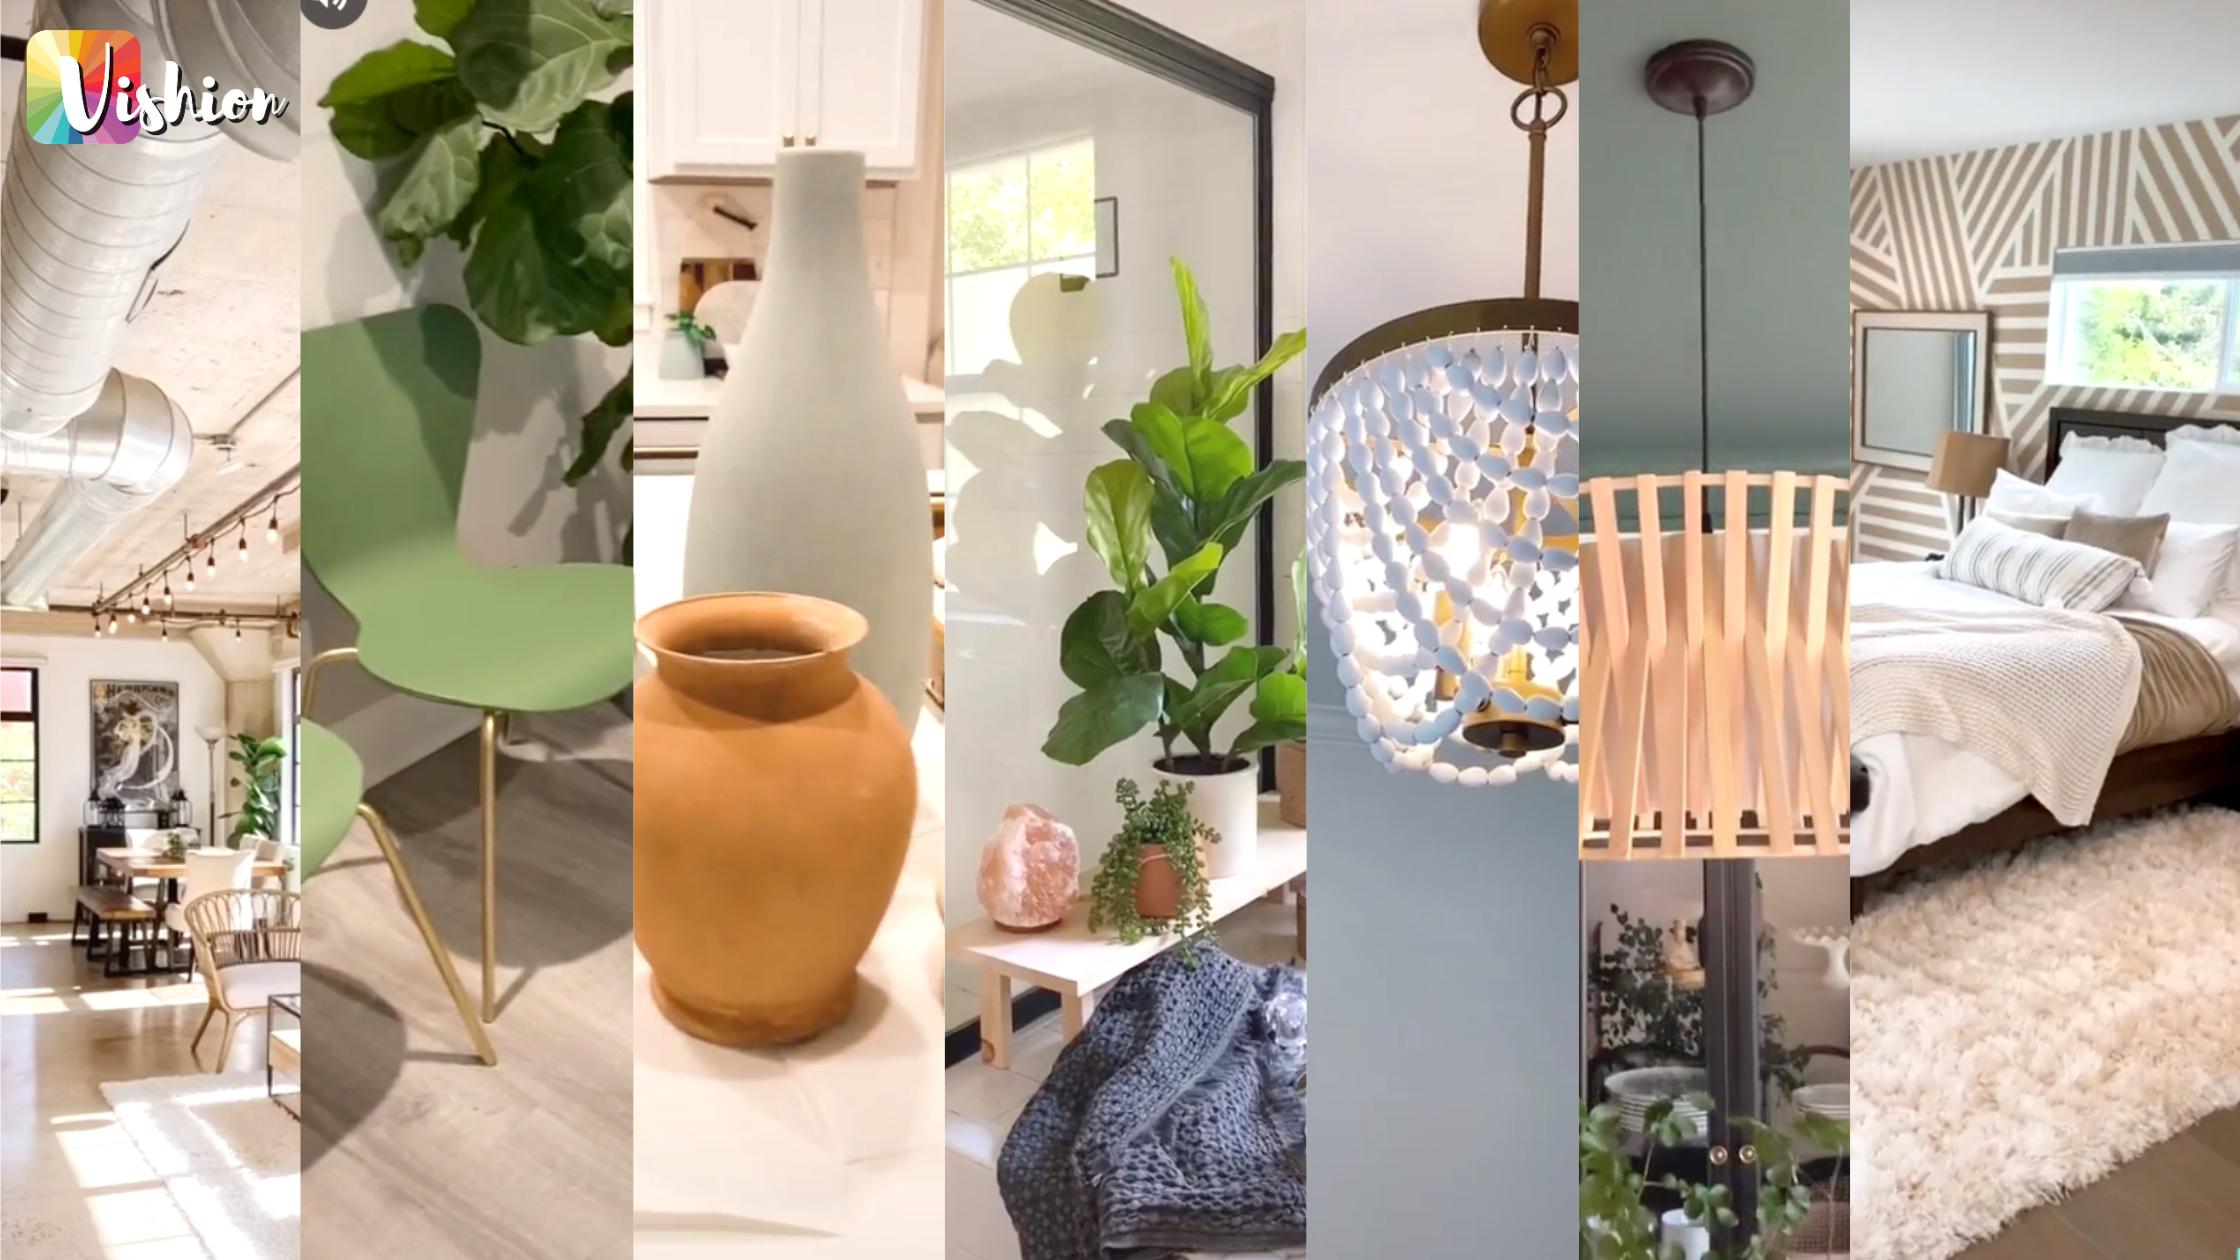 The BEST TikTok DIY and Interior Design Tips   Vishion